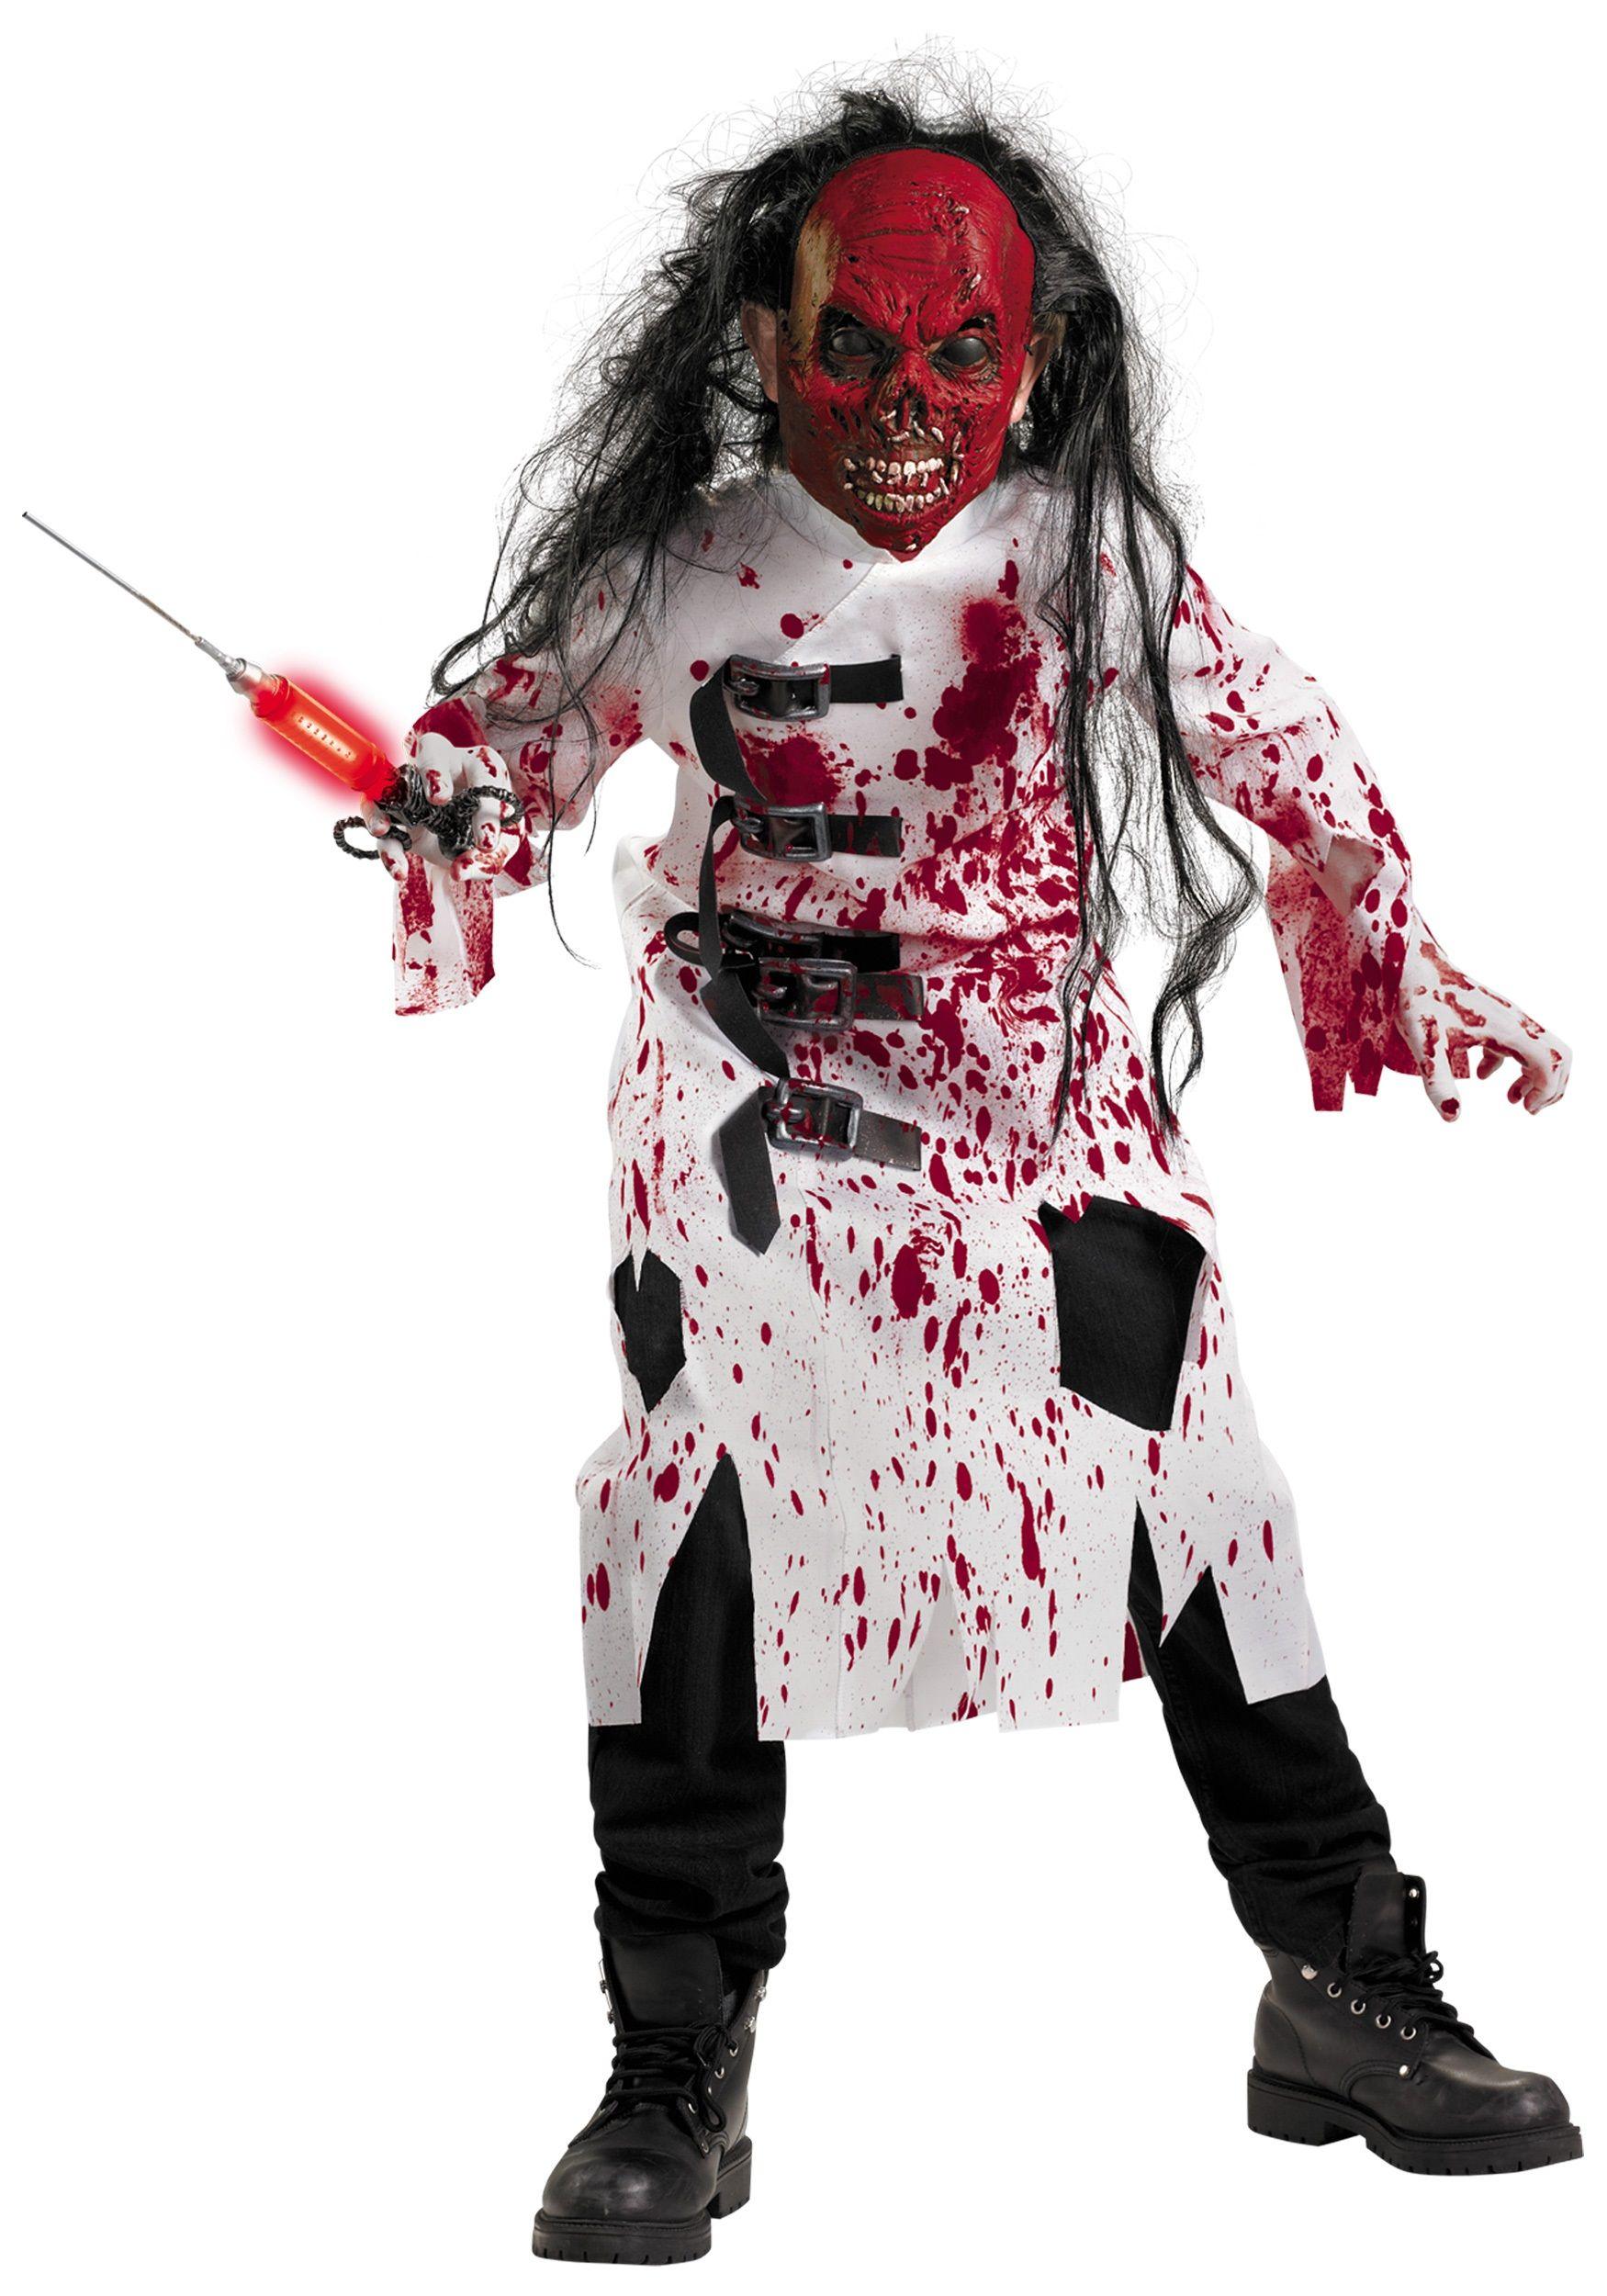 Kids Doctor Dementia Costume  sc 1 st  Pinterest & Kids Doctor Dementia Costume | ??????? ????????? | Pinterest ...